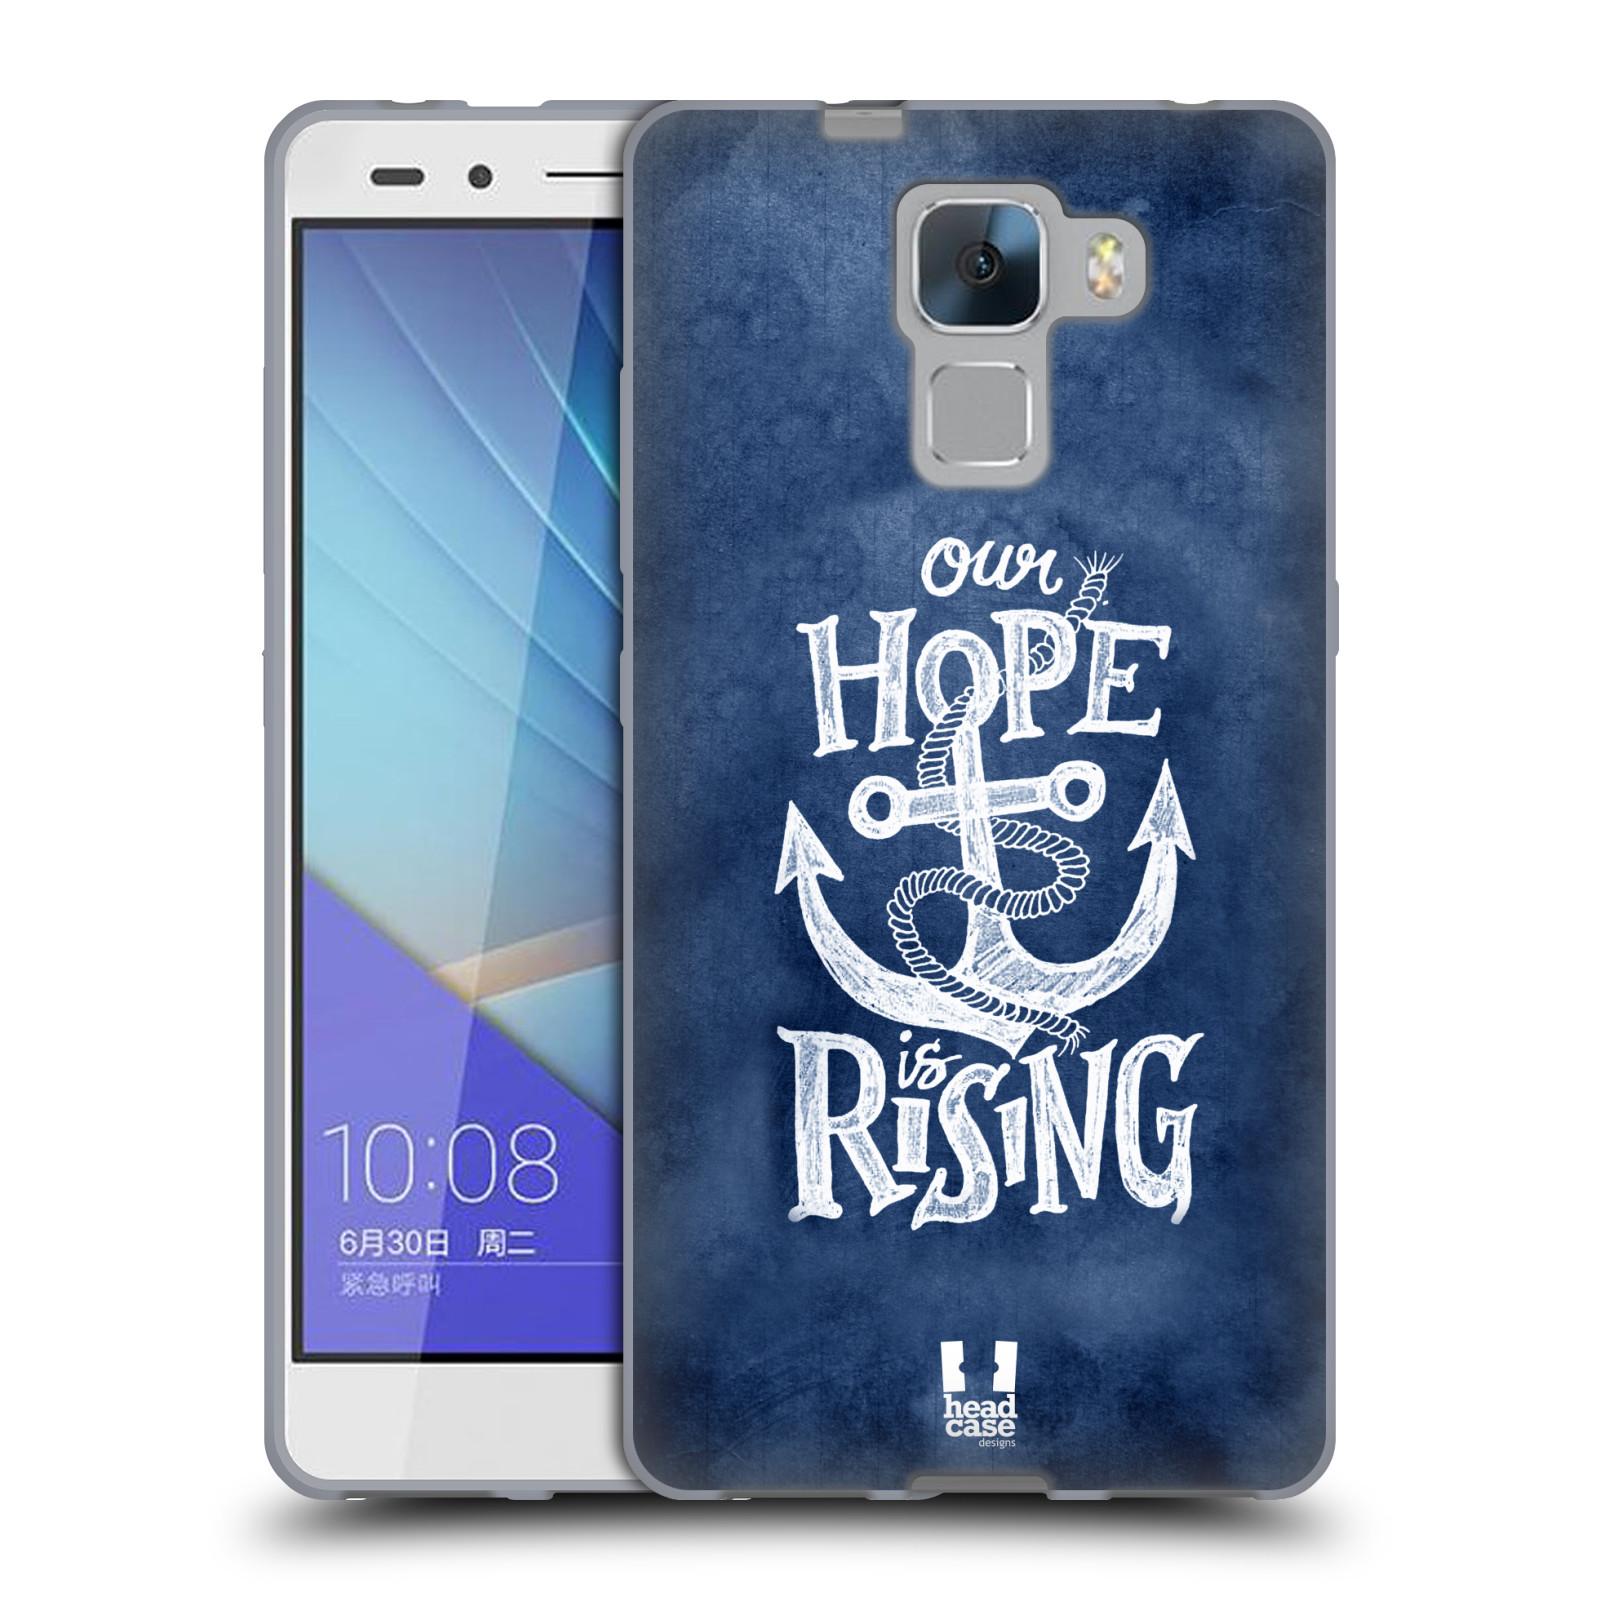 Silikonové pouzdro na mobil Honor 7 HEAD CASE KOTVA RISING